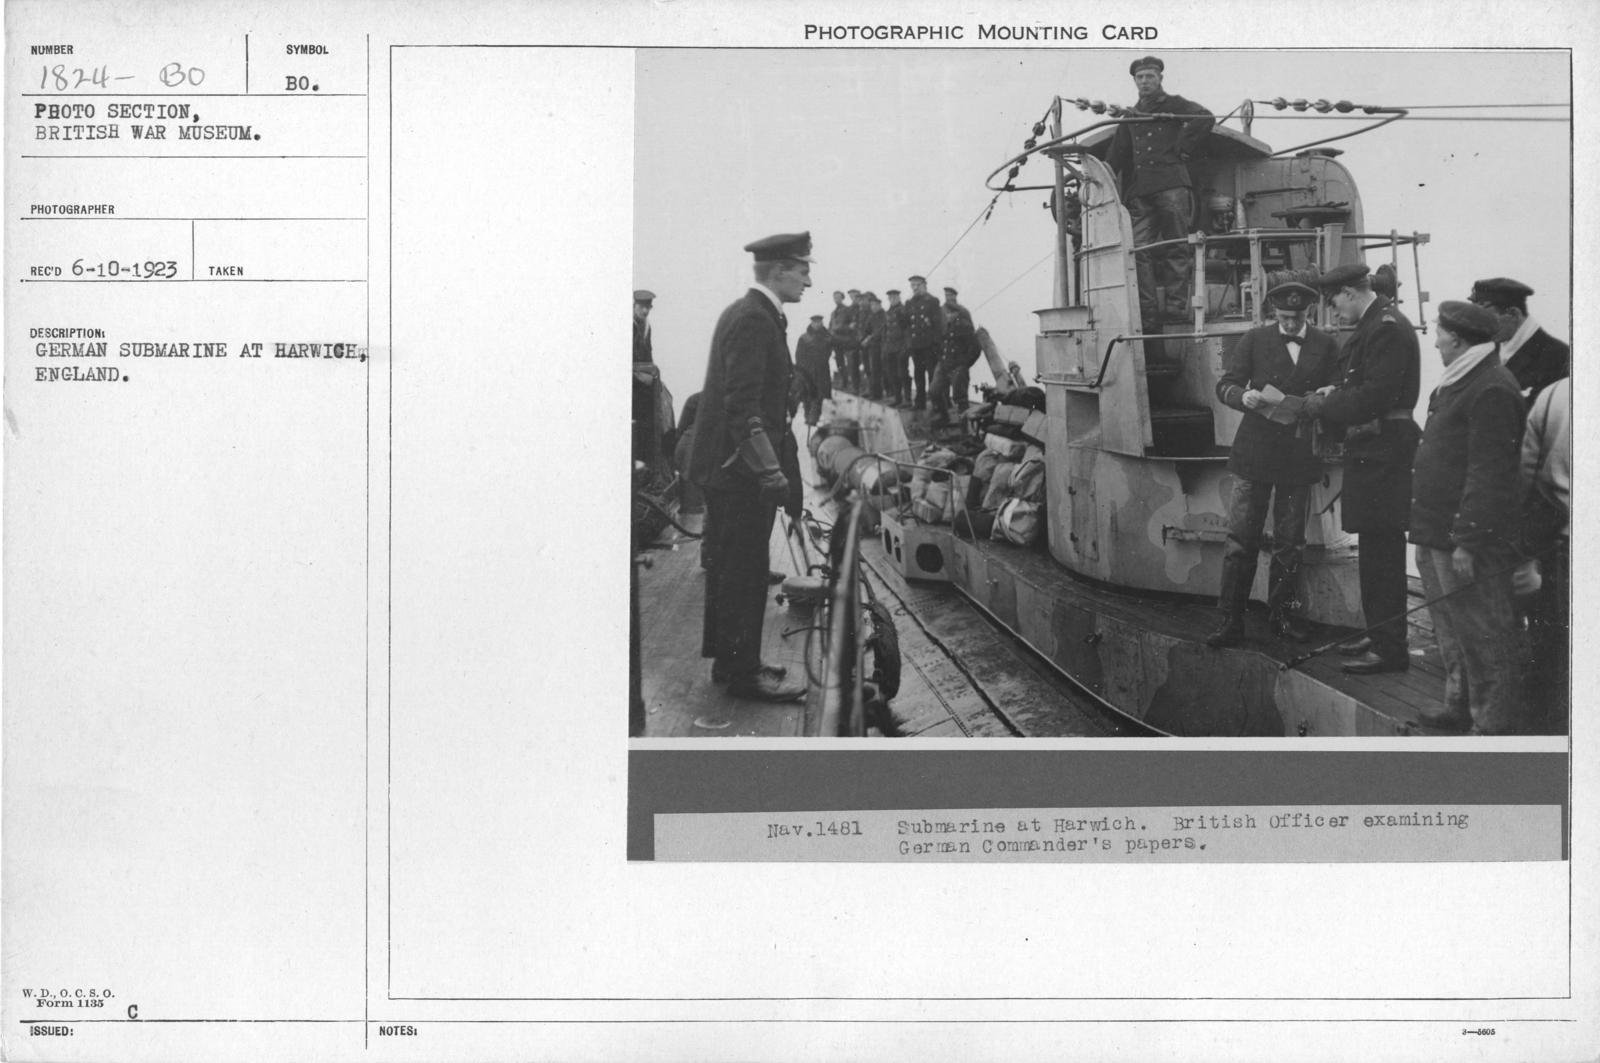 German submarine at Harwich, England